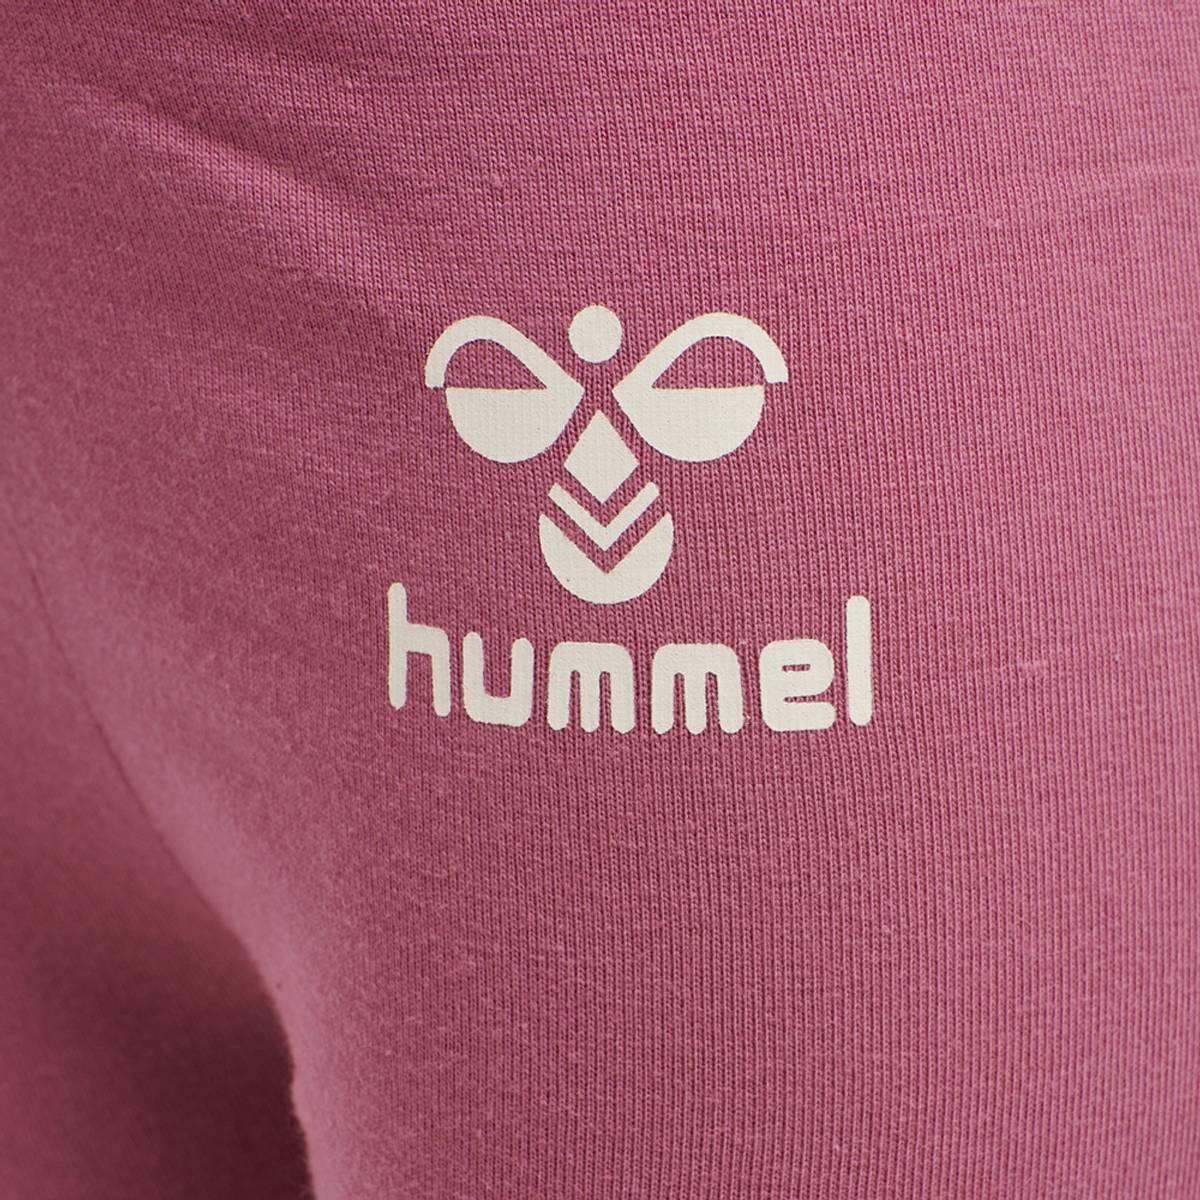 Hummel Maui Tights   Heather Rose